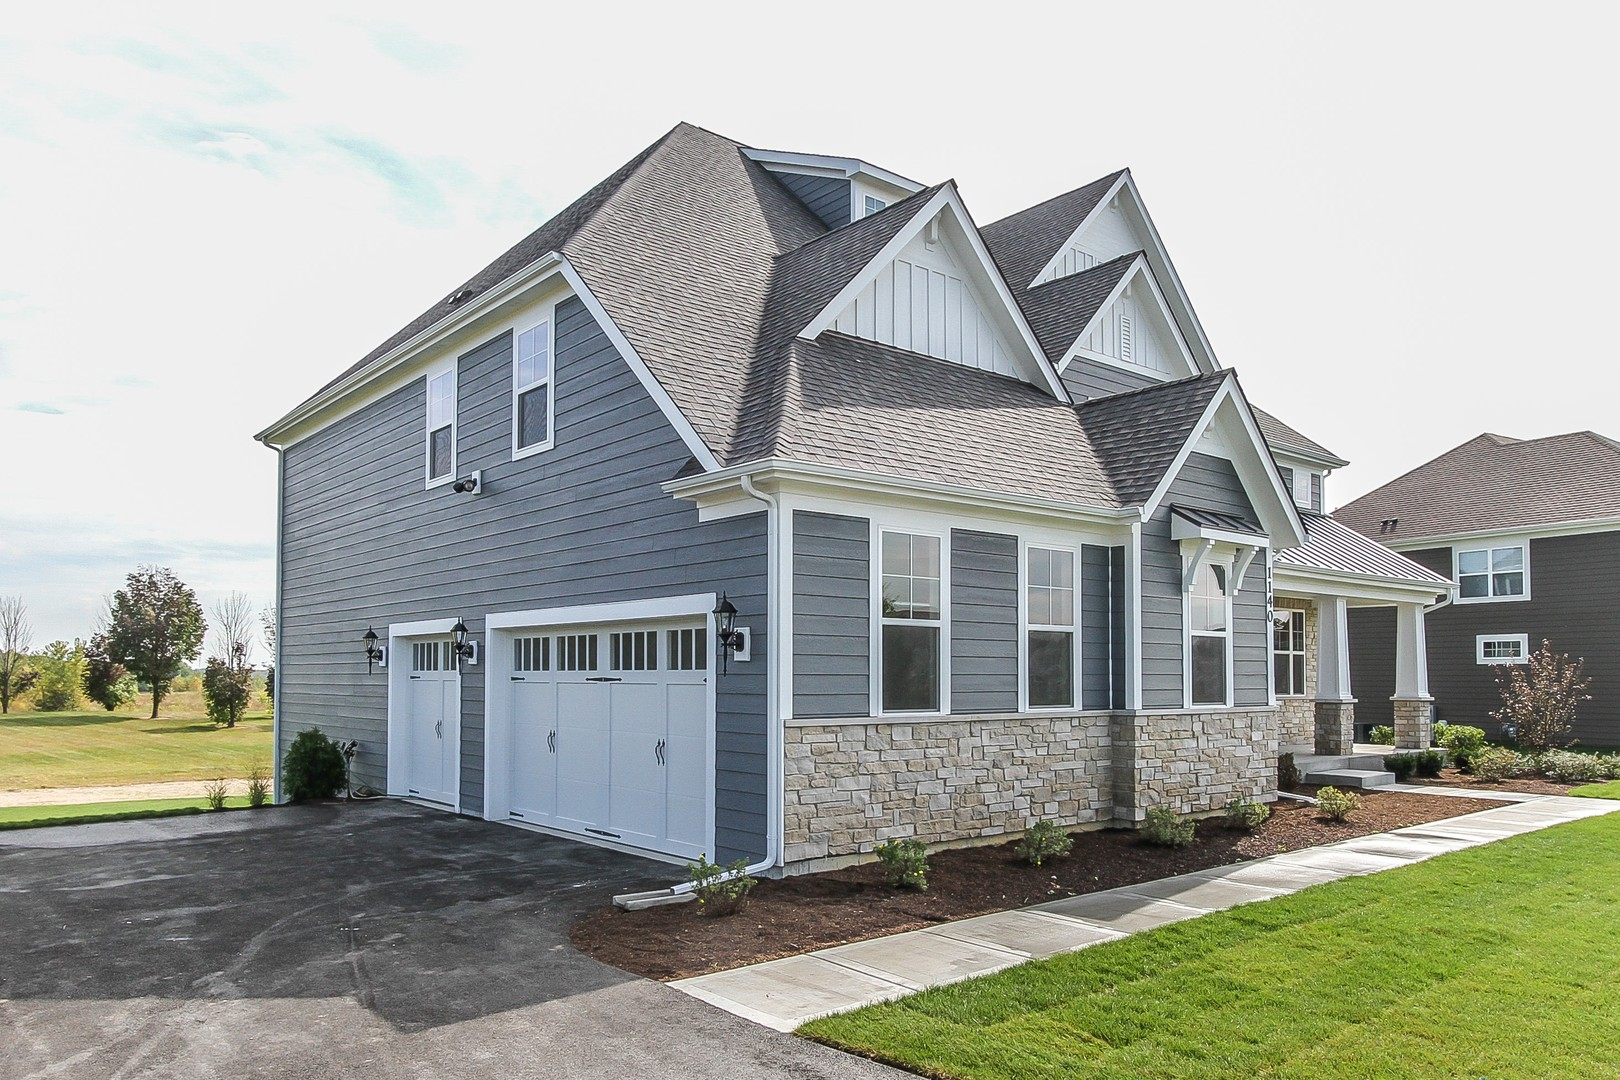 Lot 128 Hilldale, ST. CHARLES, Illinois, 60174